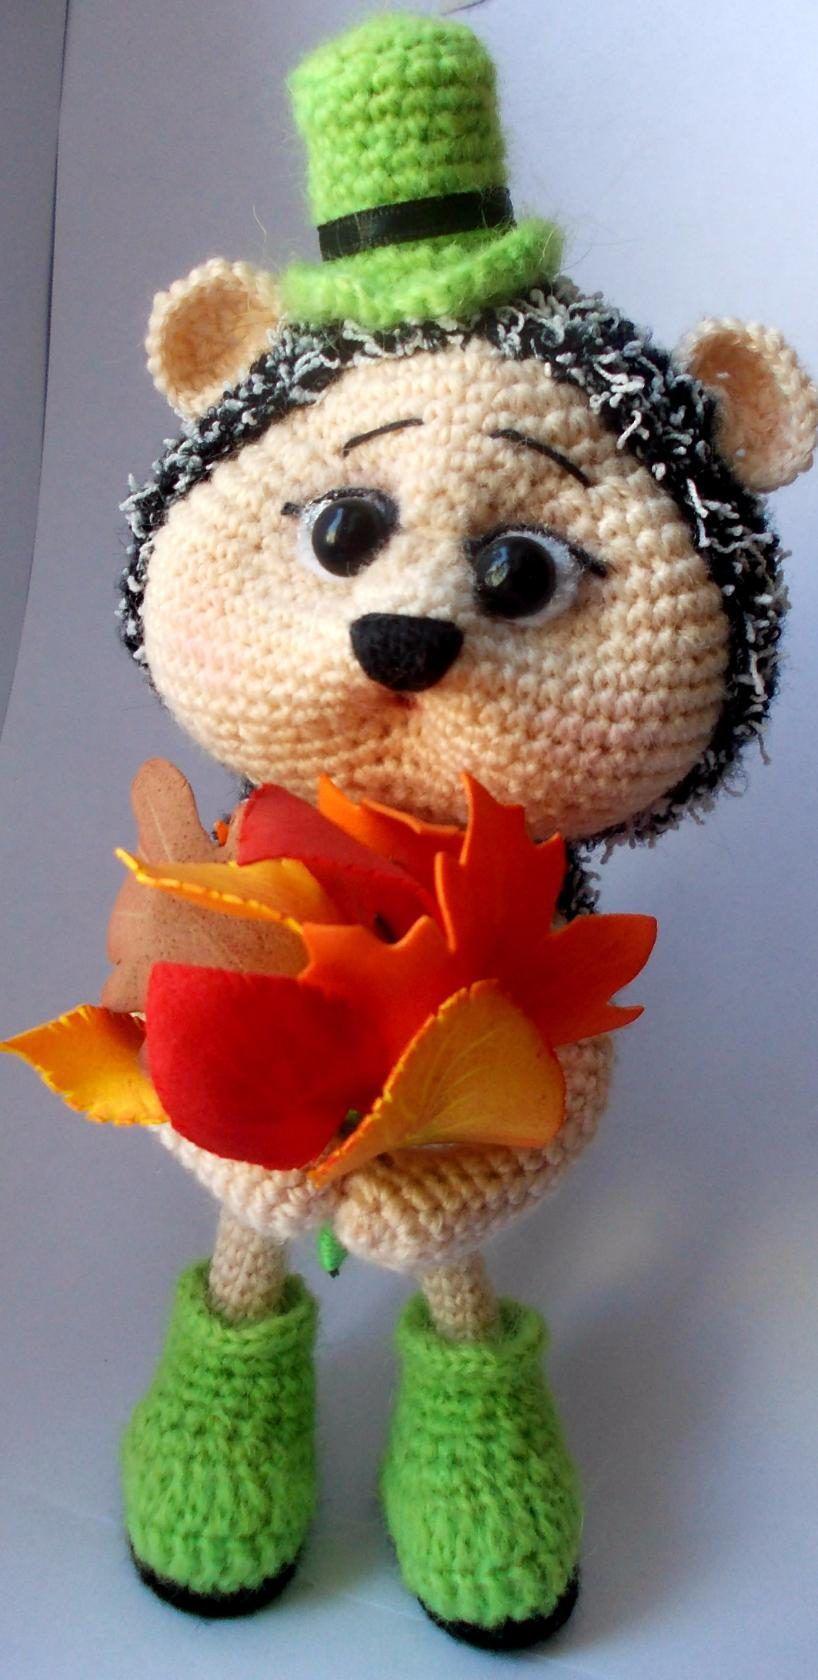 игрушка амигуруми детям подарок